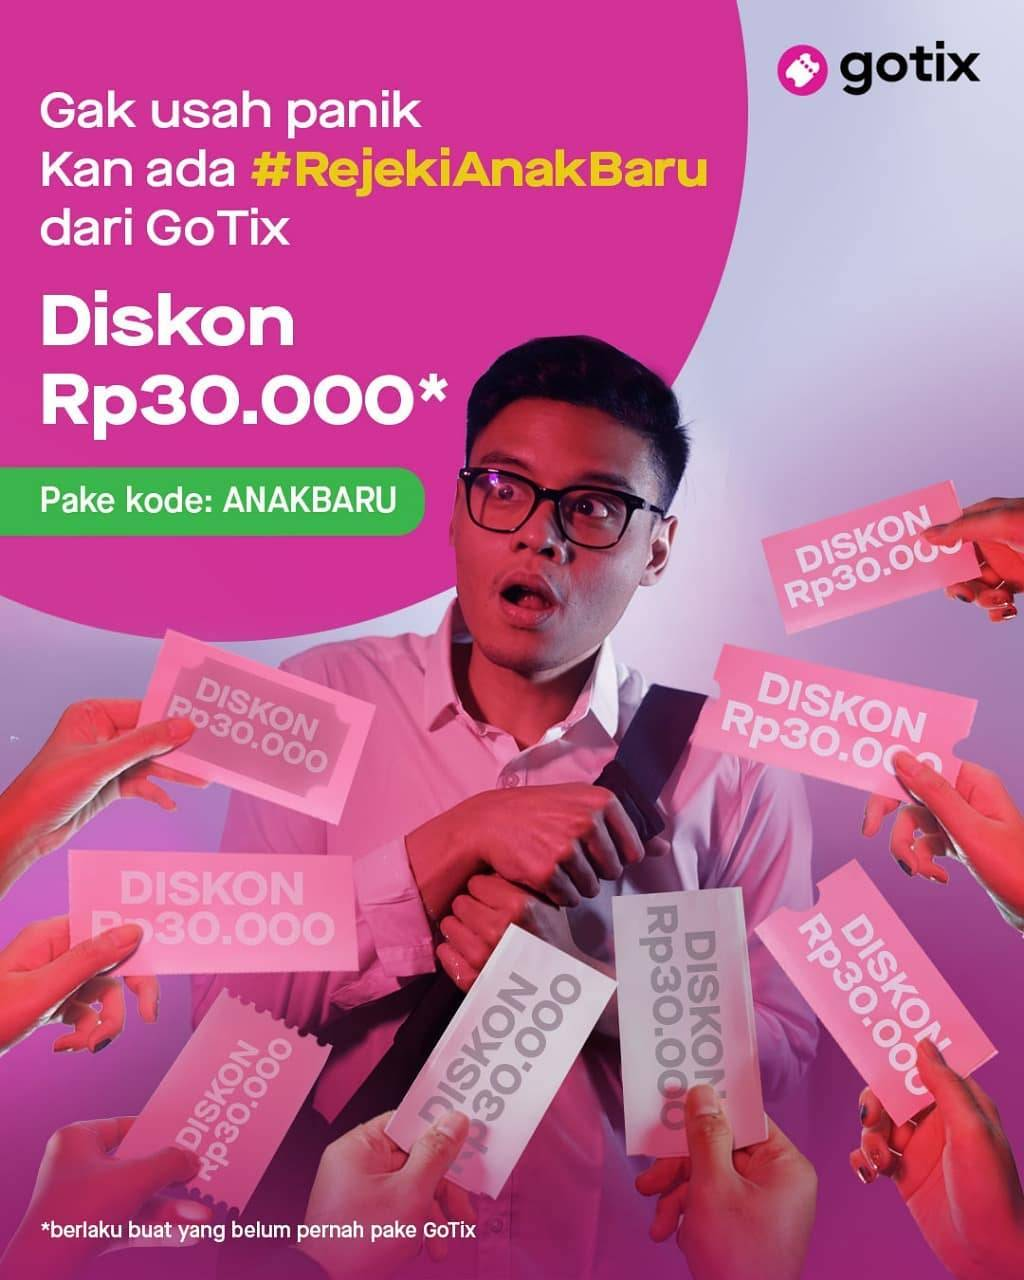 Diskon Gotix Promo Diskon Rp30.000 Buat Kamu si Anak Baru